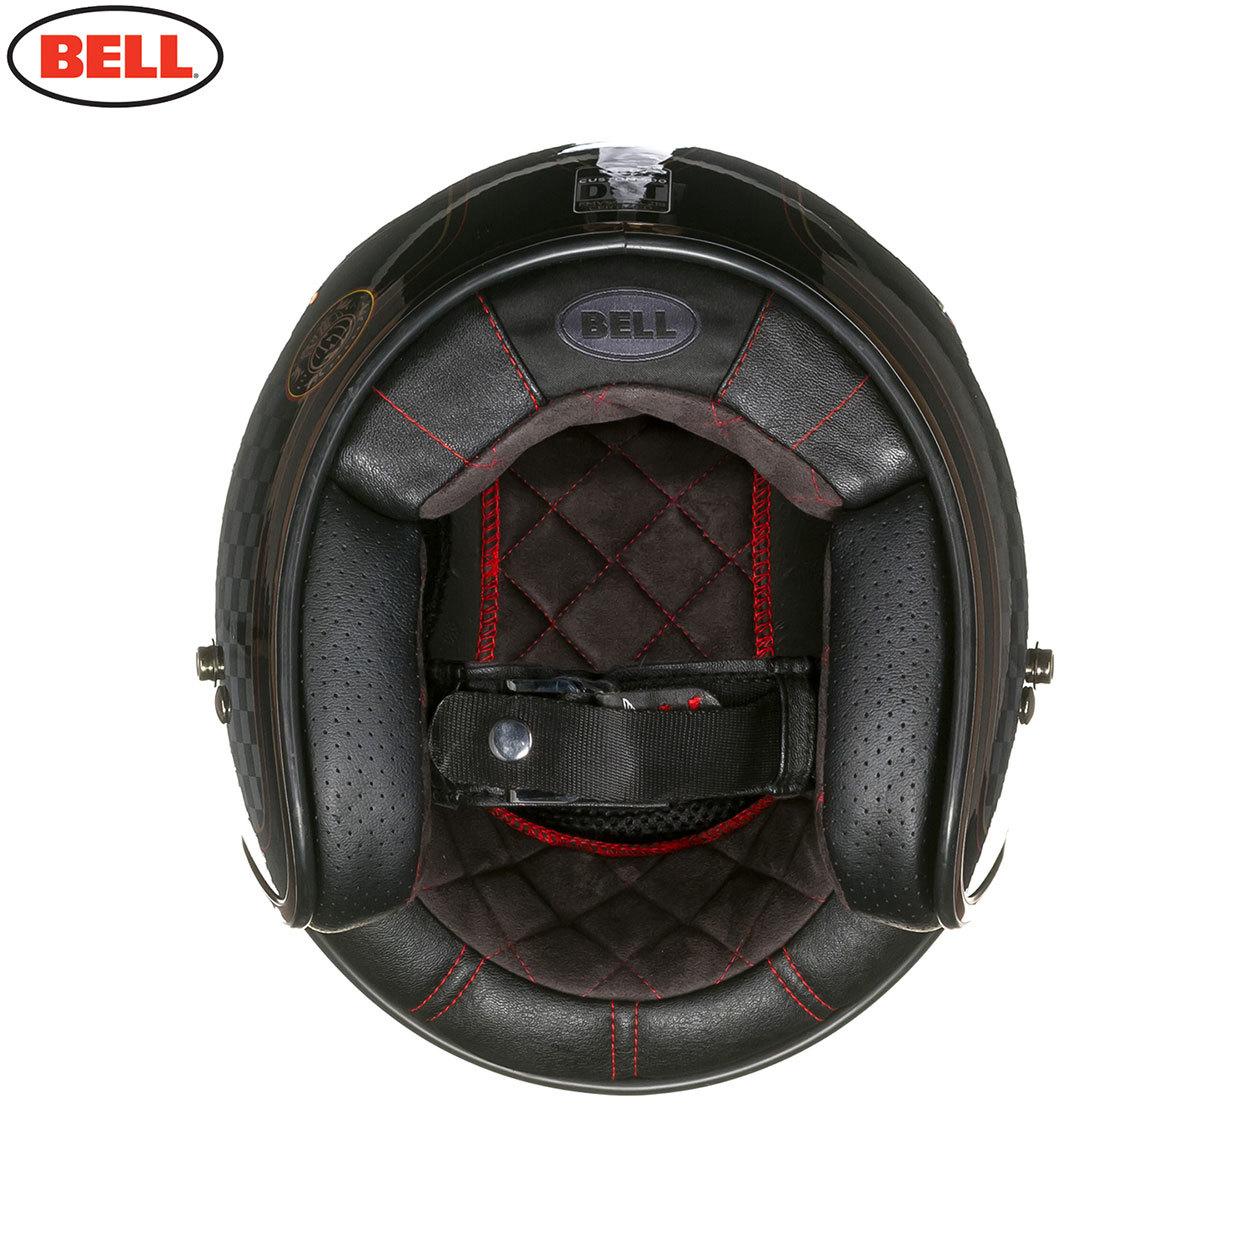 aaf23cfb Bell - Custom 500 SE RSD Helmet - Check it Deluxe — Motociclo Online Store